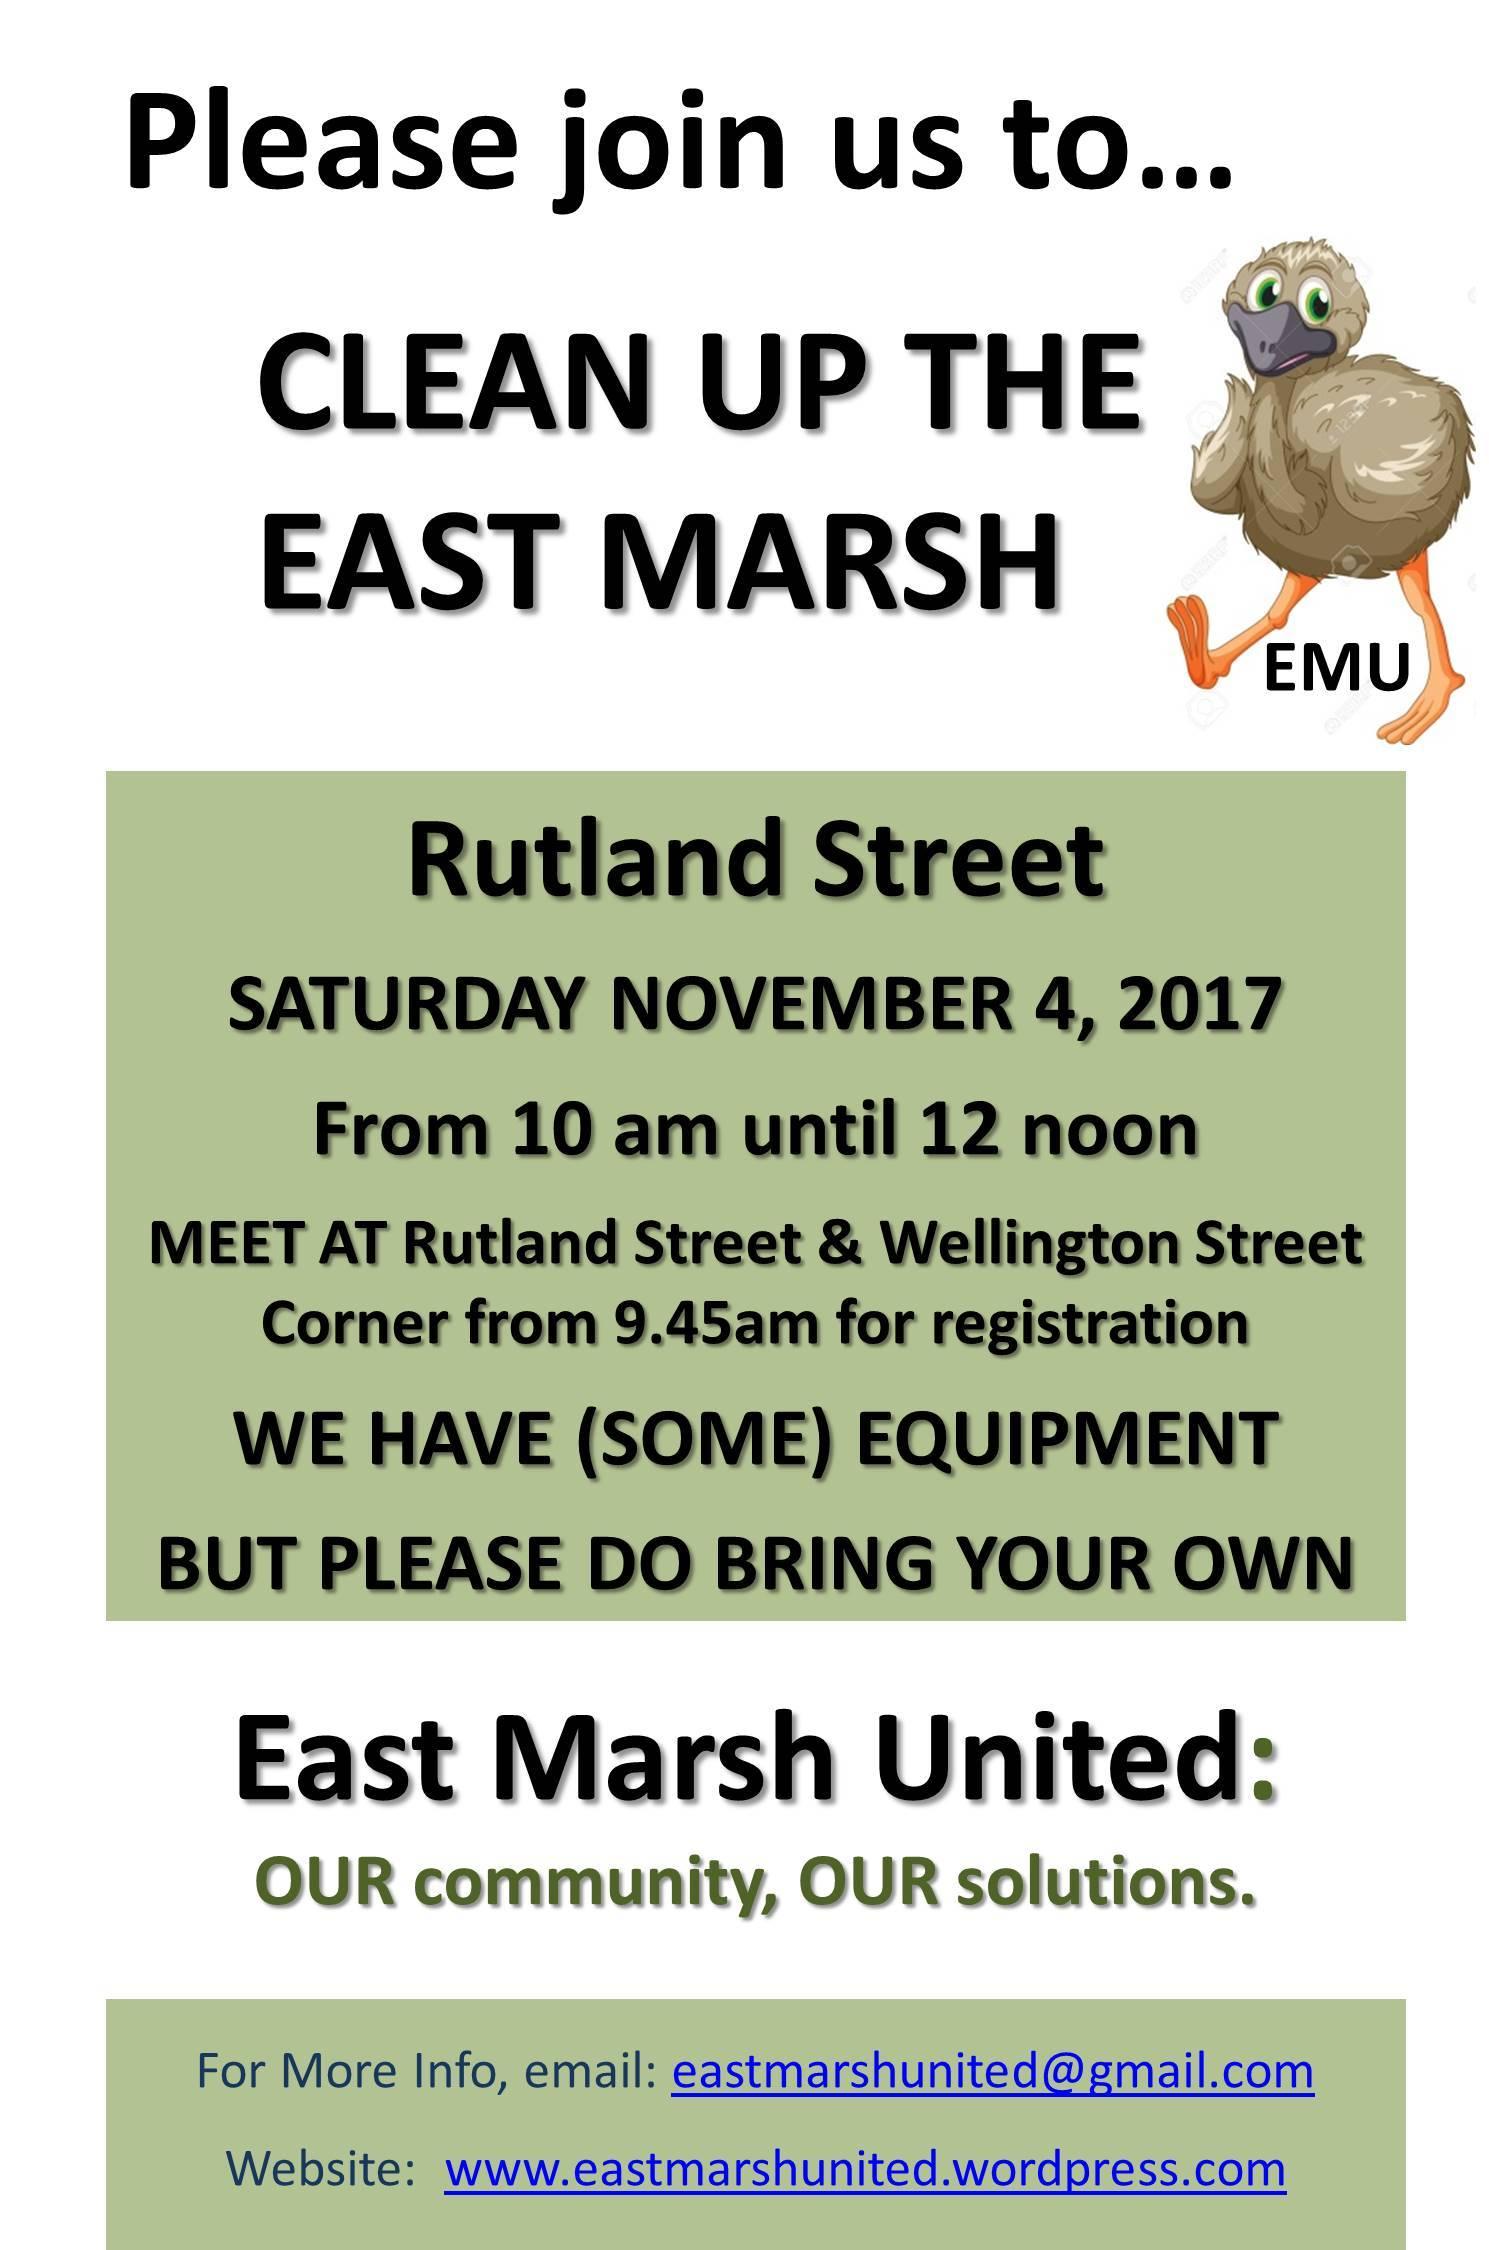 East Marsh United Flyer 1 Rutland Street